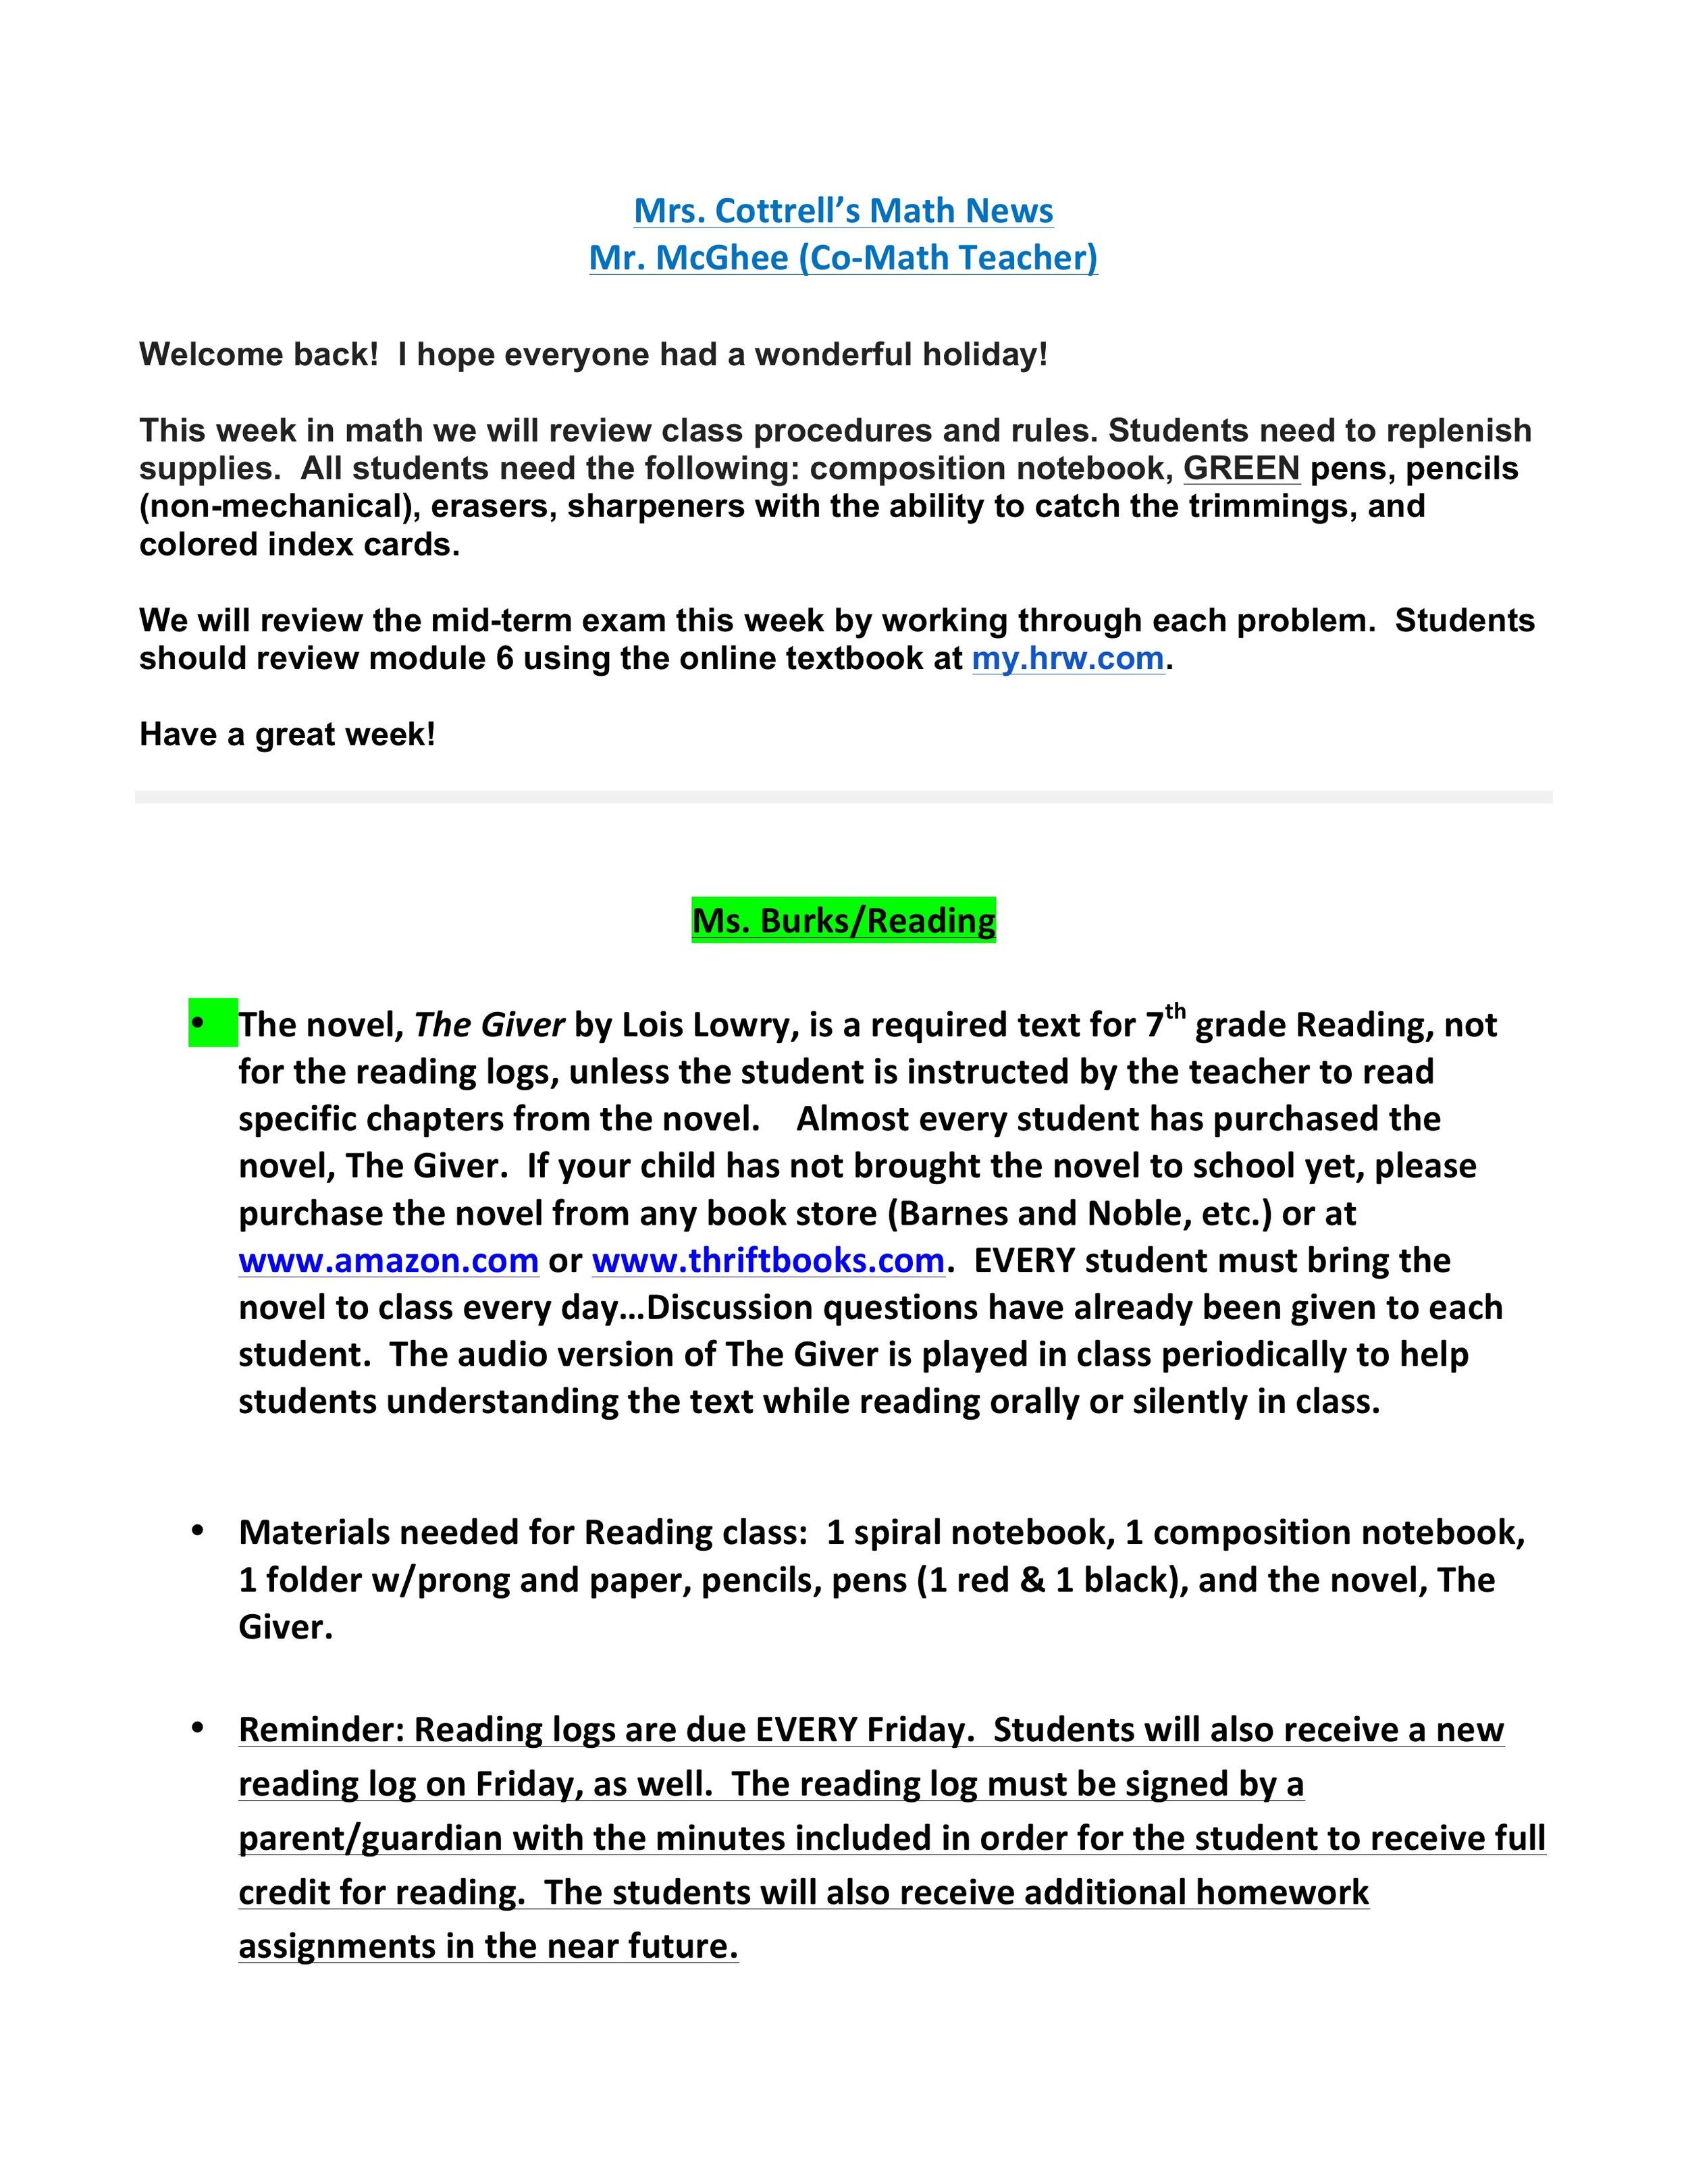 Newsletter Image7th grade January 6 2015 2.jpeg